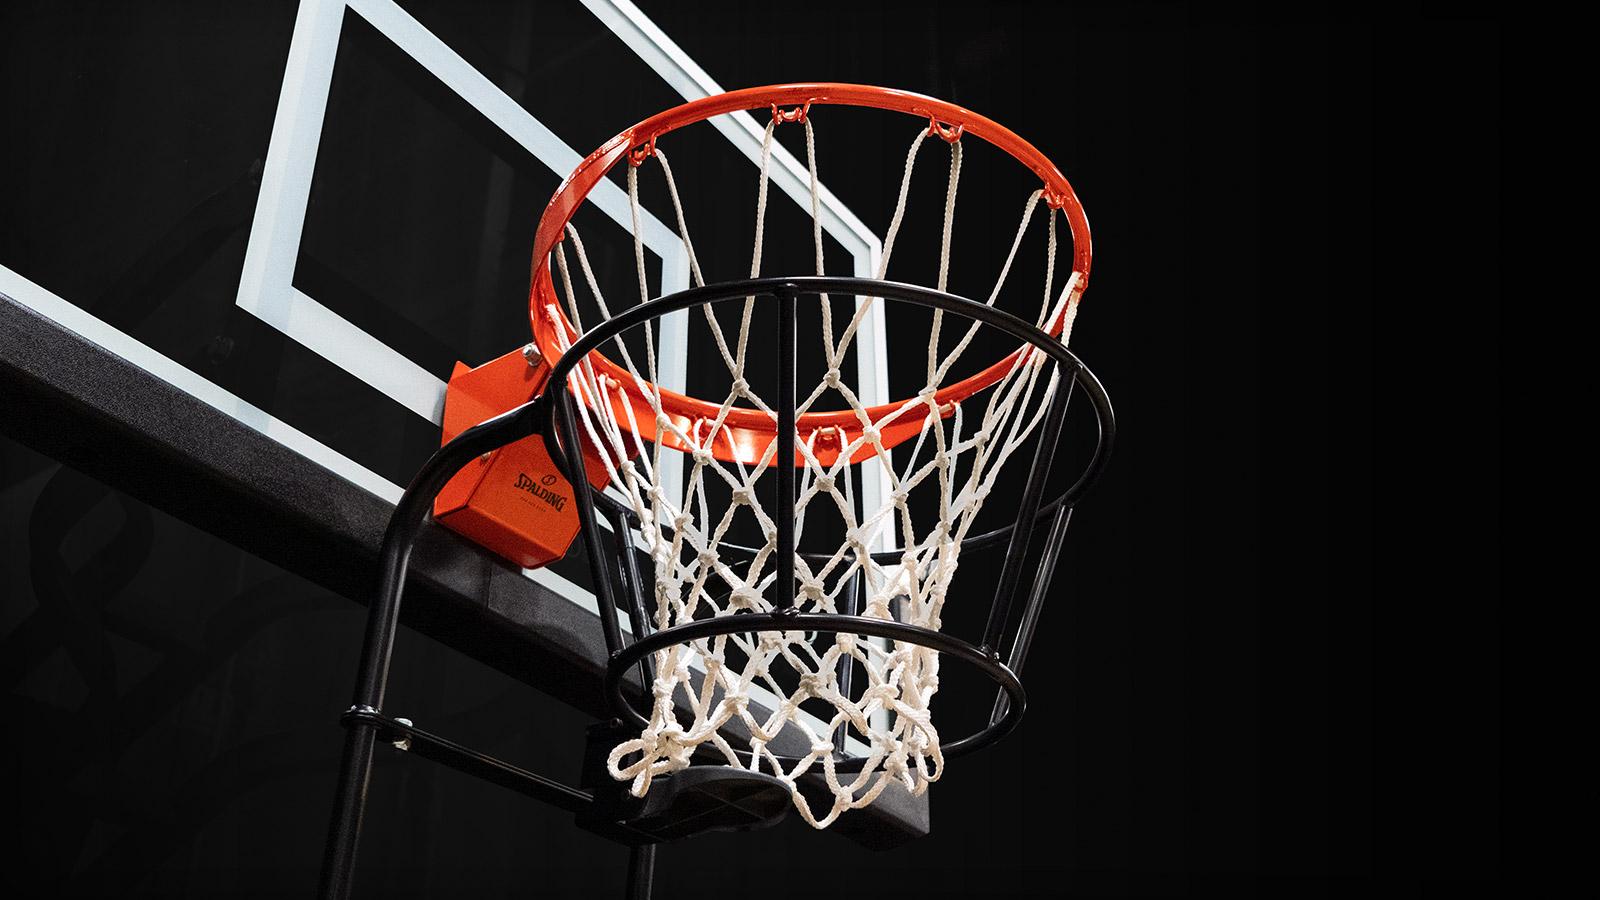 Dr. Dish Basketball Shots Made Counter on Basketball Hoop